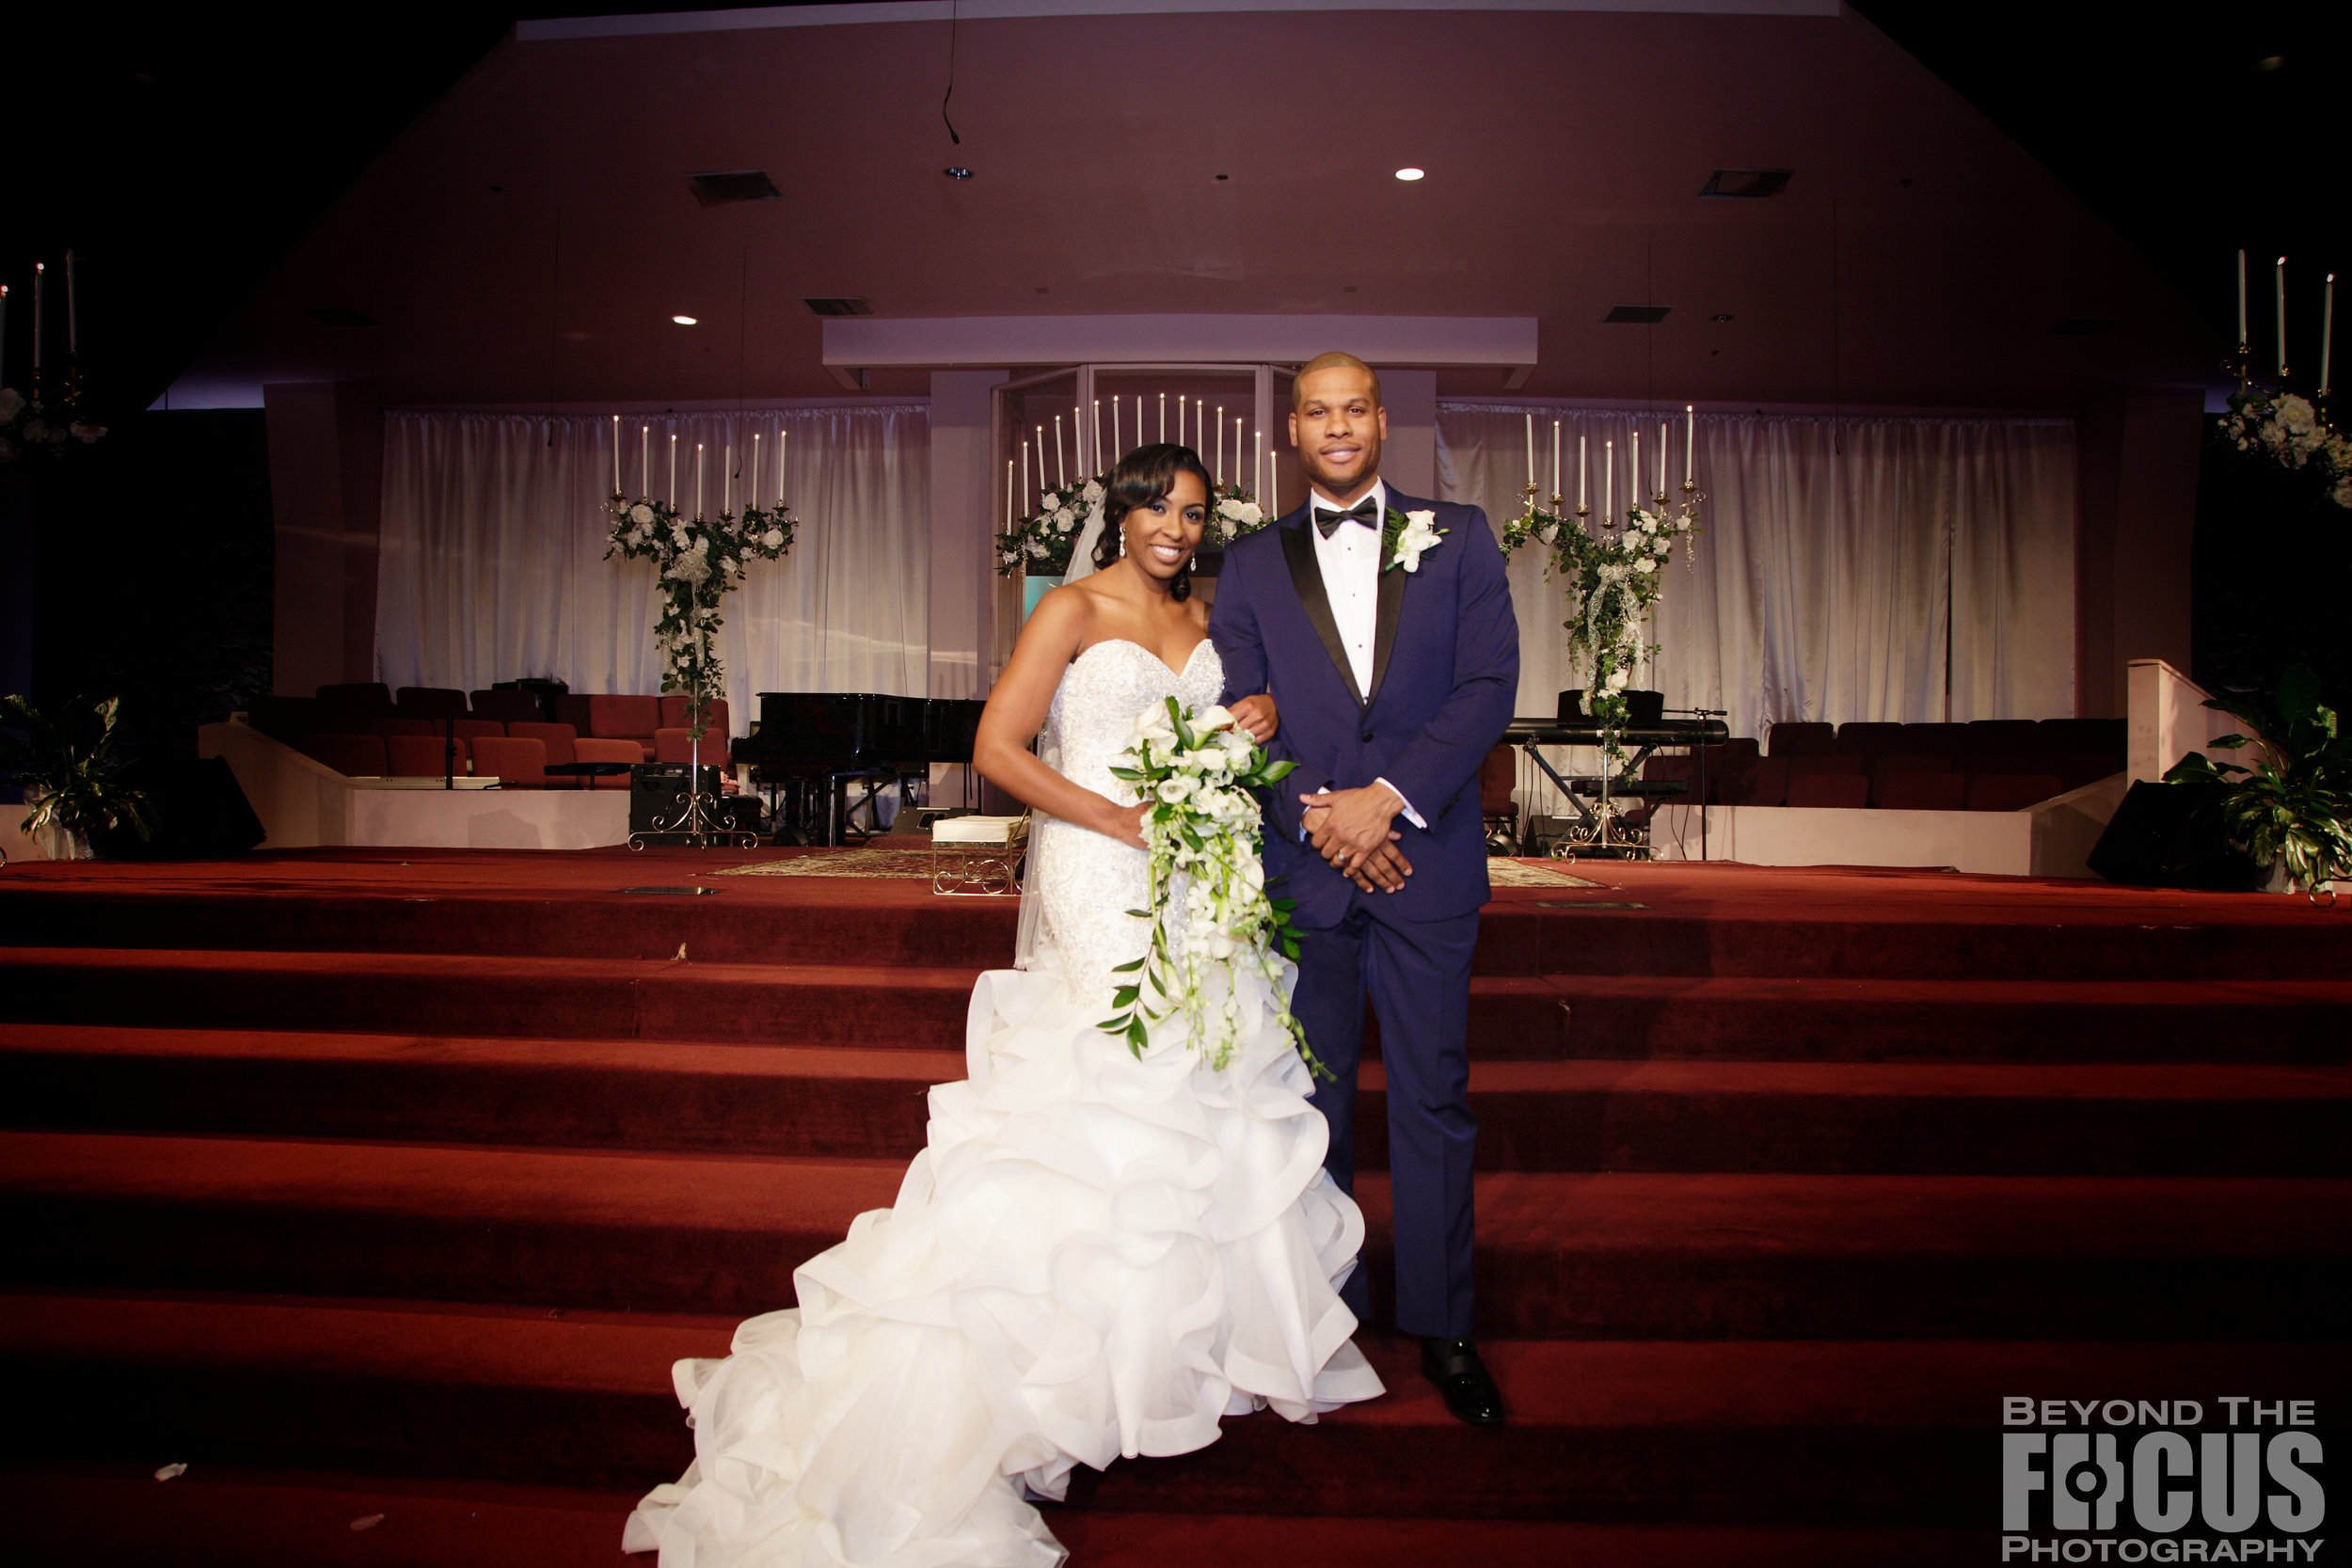 Matthews_Wedding_Ceremony_147.jpg